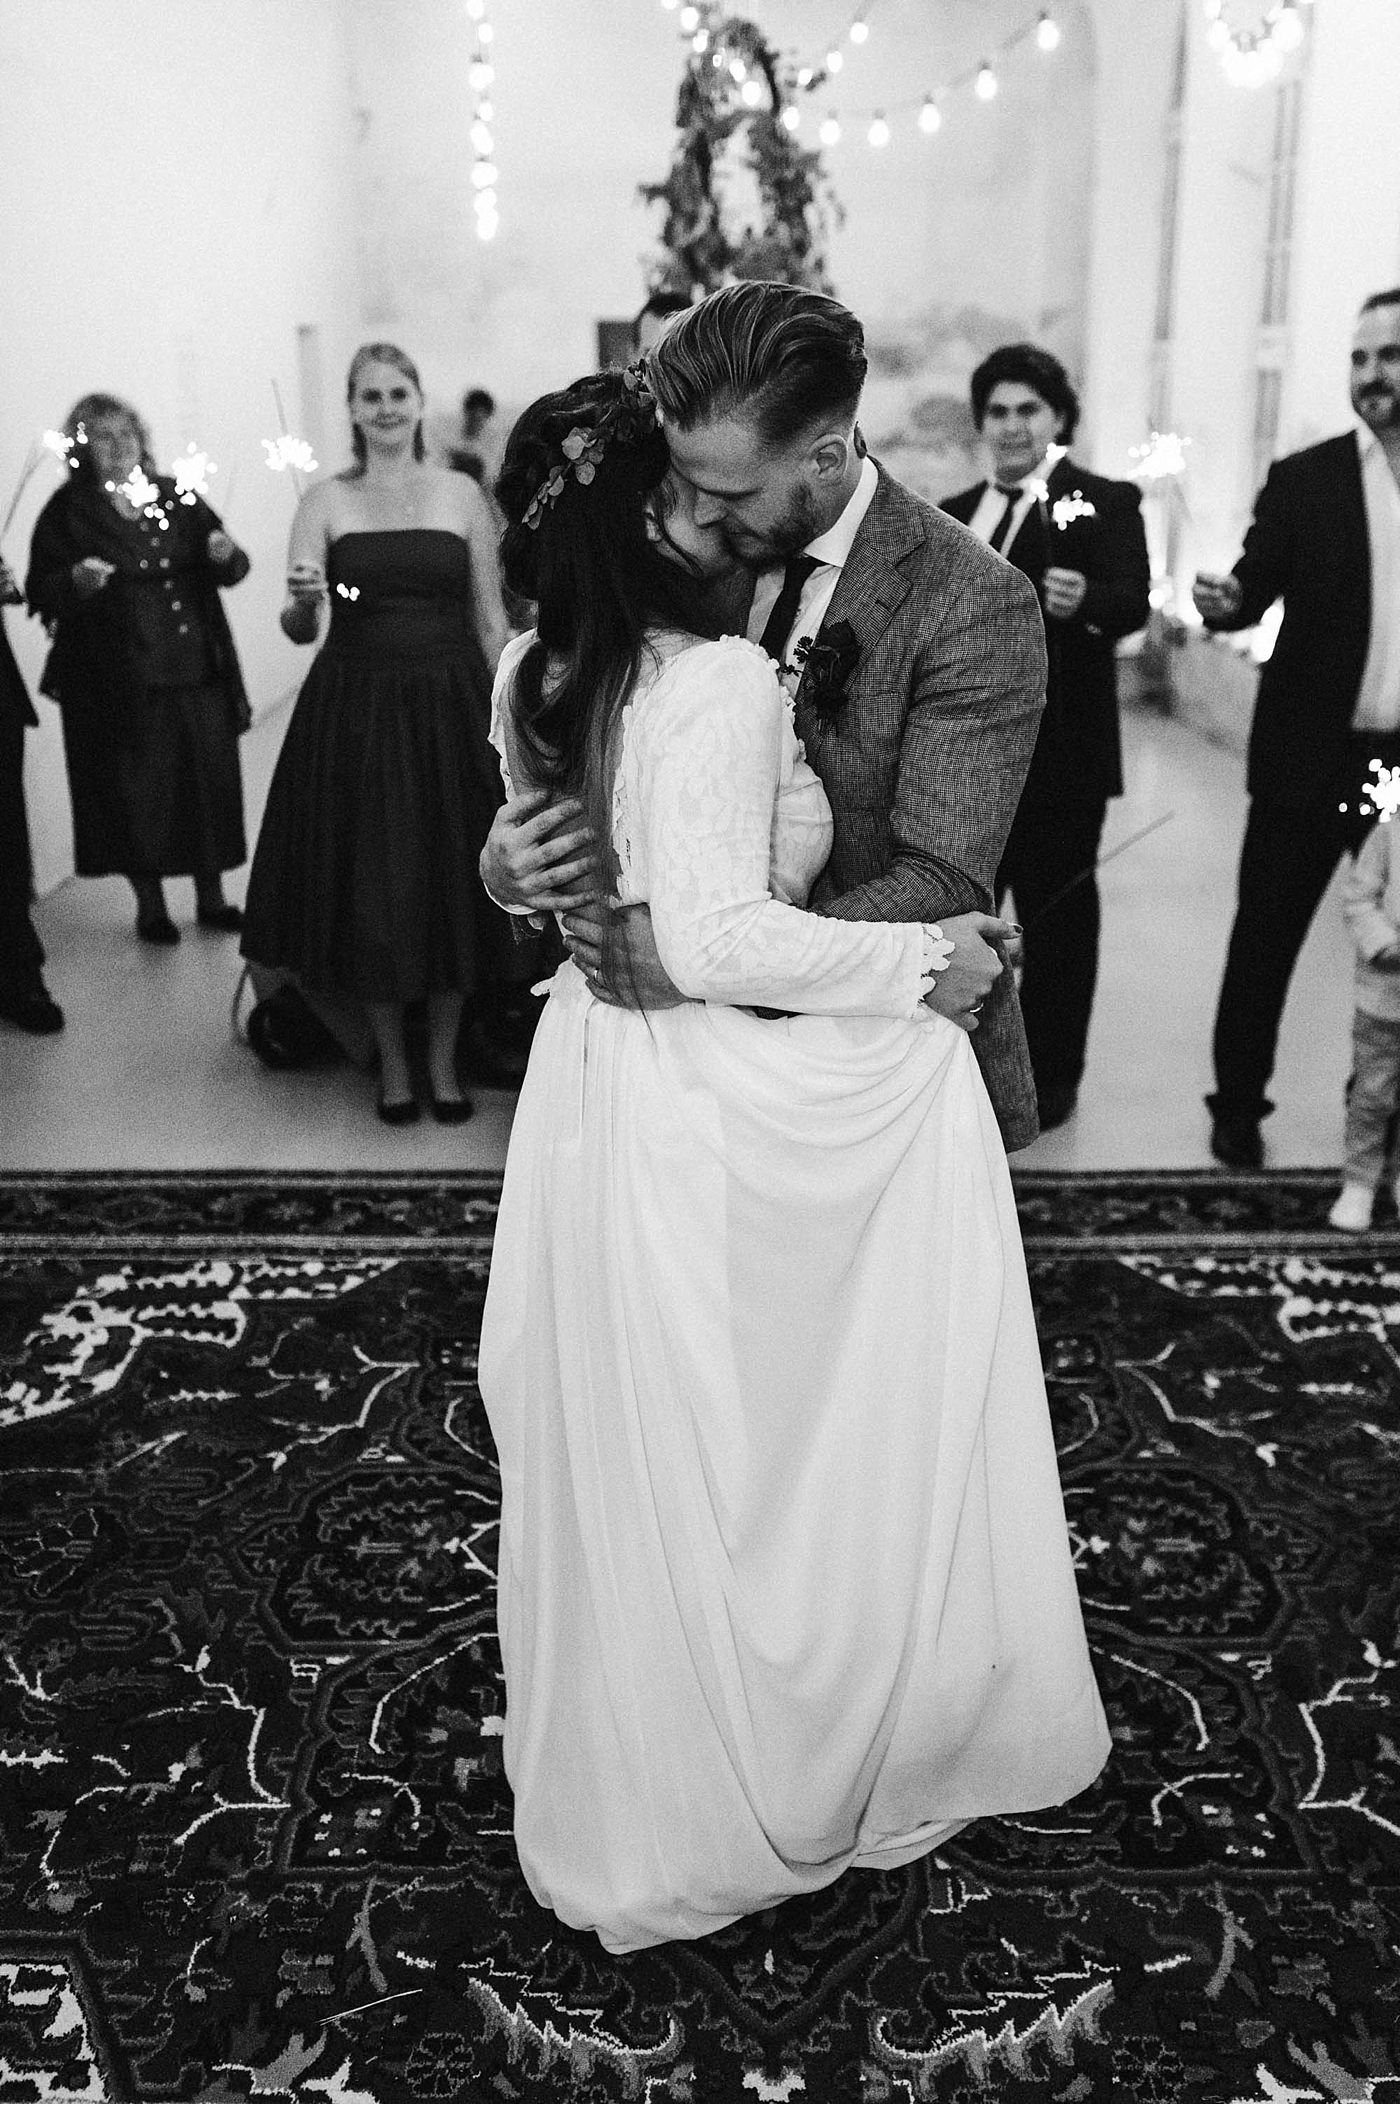 urban-elopement-wedding-266